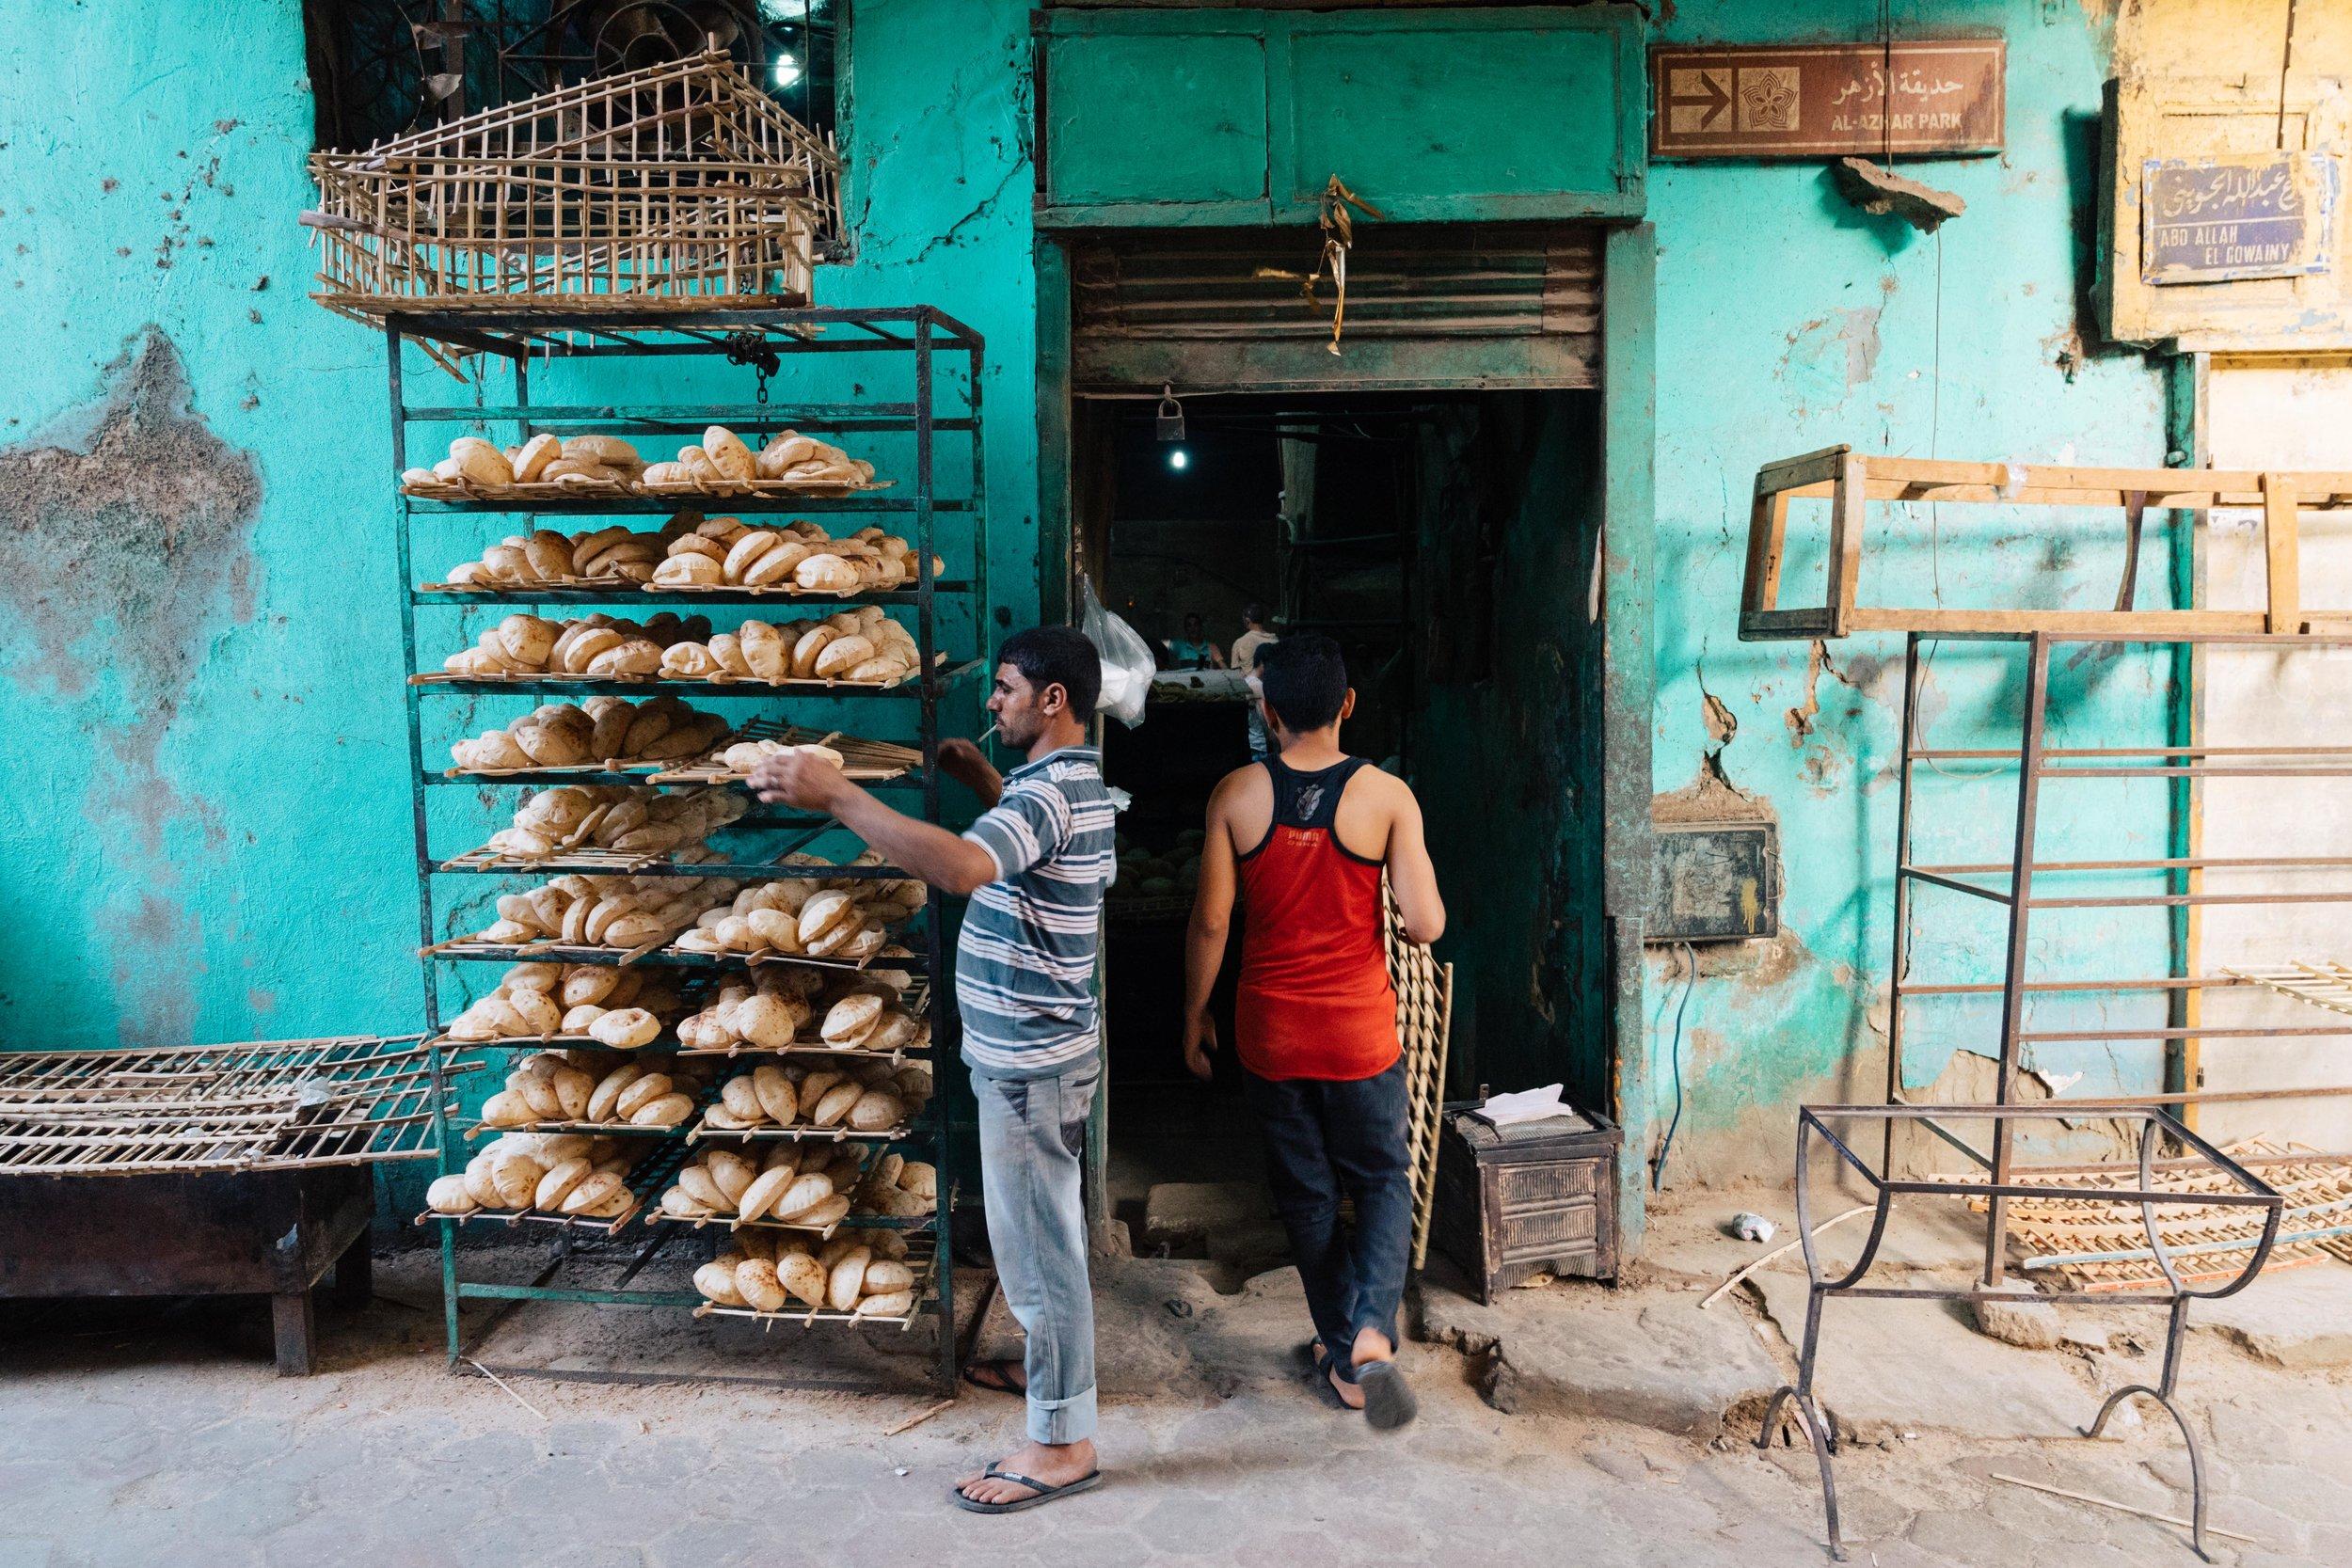 An aish baladi (flatbread) bakery